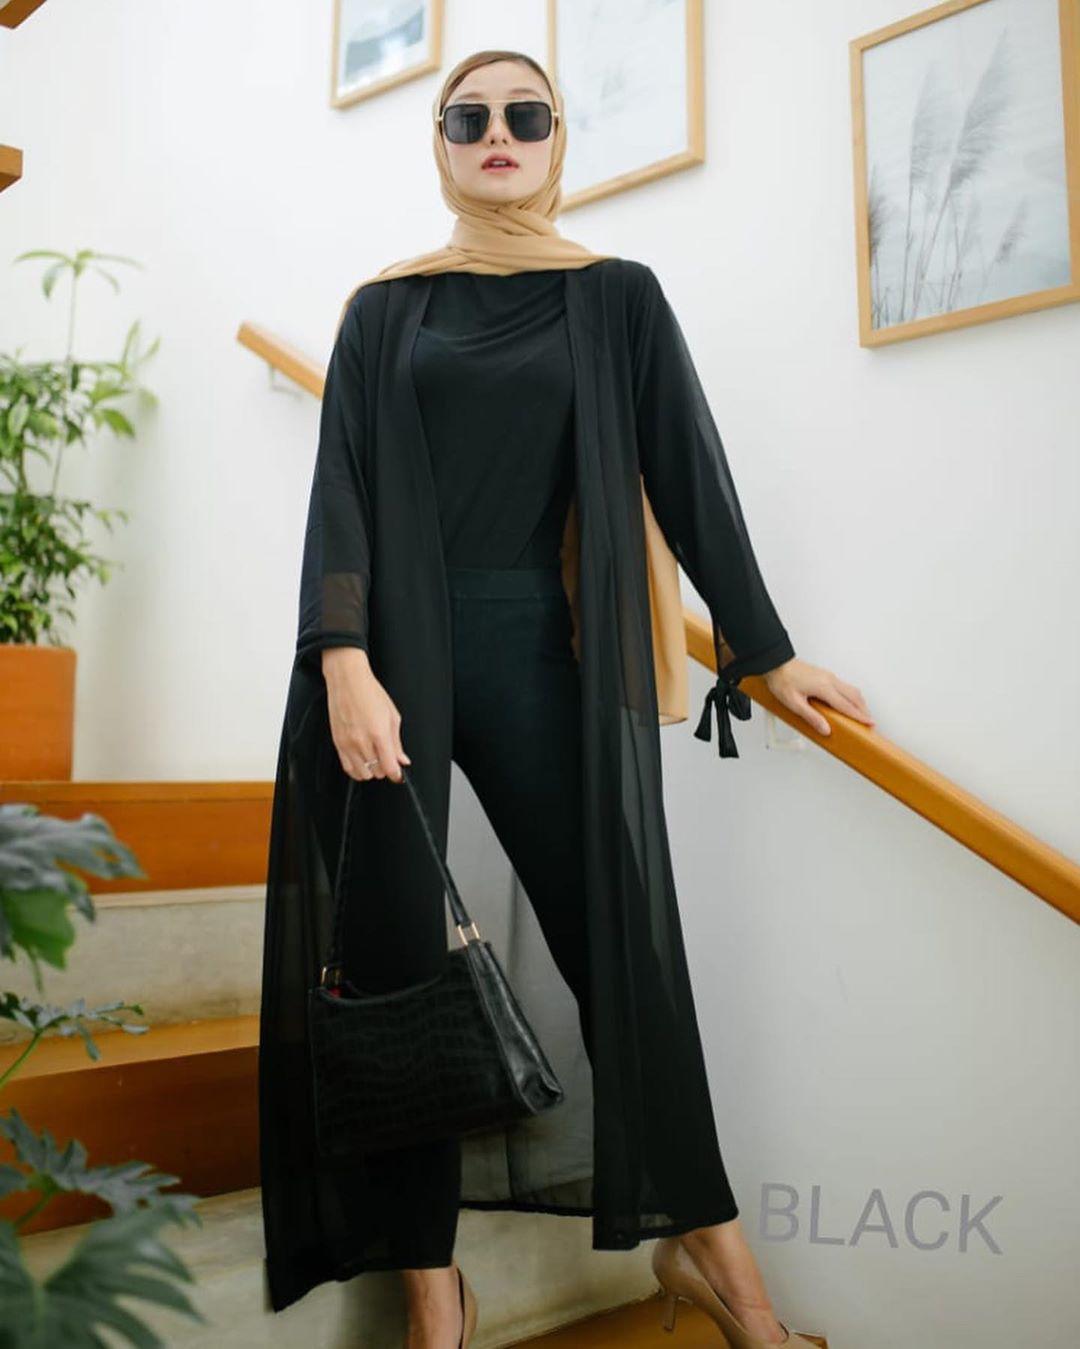 felly long outer / outer wanita / outer wanita hijab kekinian / outer cardigan / outer bahan ceruty / outer polos / long outer wanita / ootd hijab style remaja / ootd selebgram / atasan wanita  2020 / atasan wanita lengan panjang / kardigan wanita